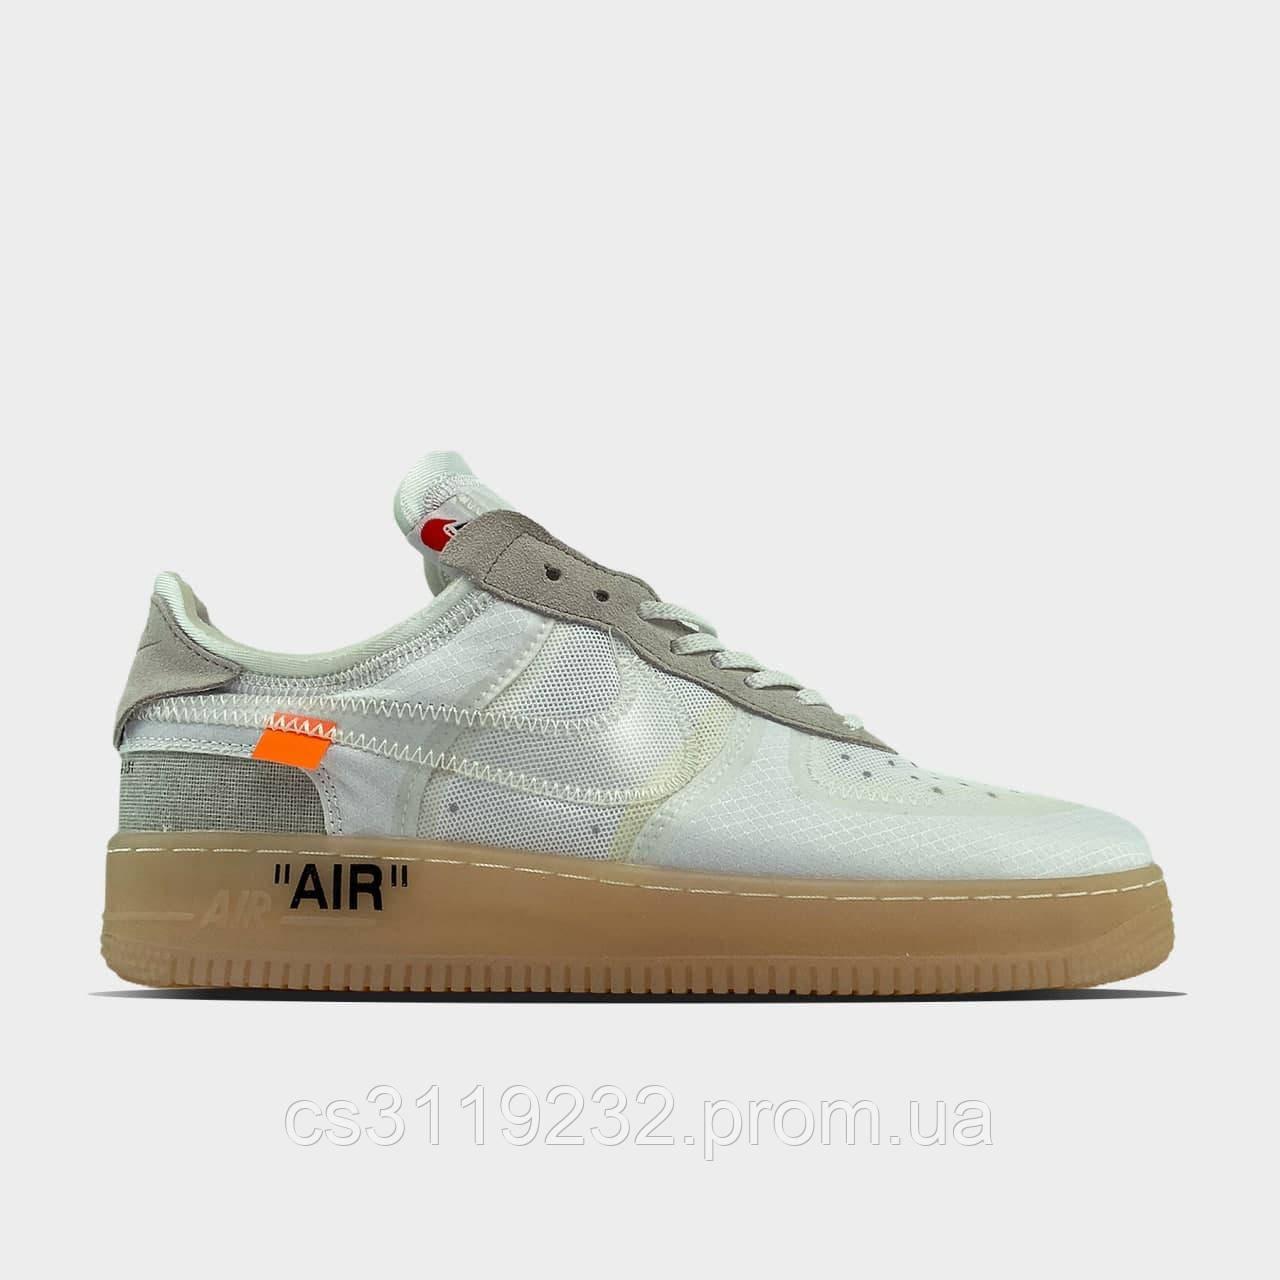 Чоловічі кросівки Nike Air Force 1 Low Off-White White Brown (білі)